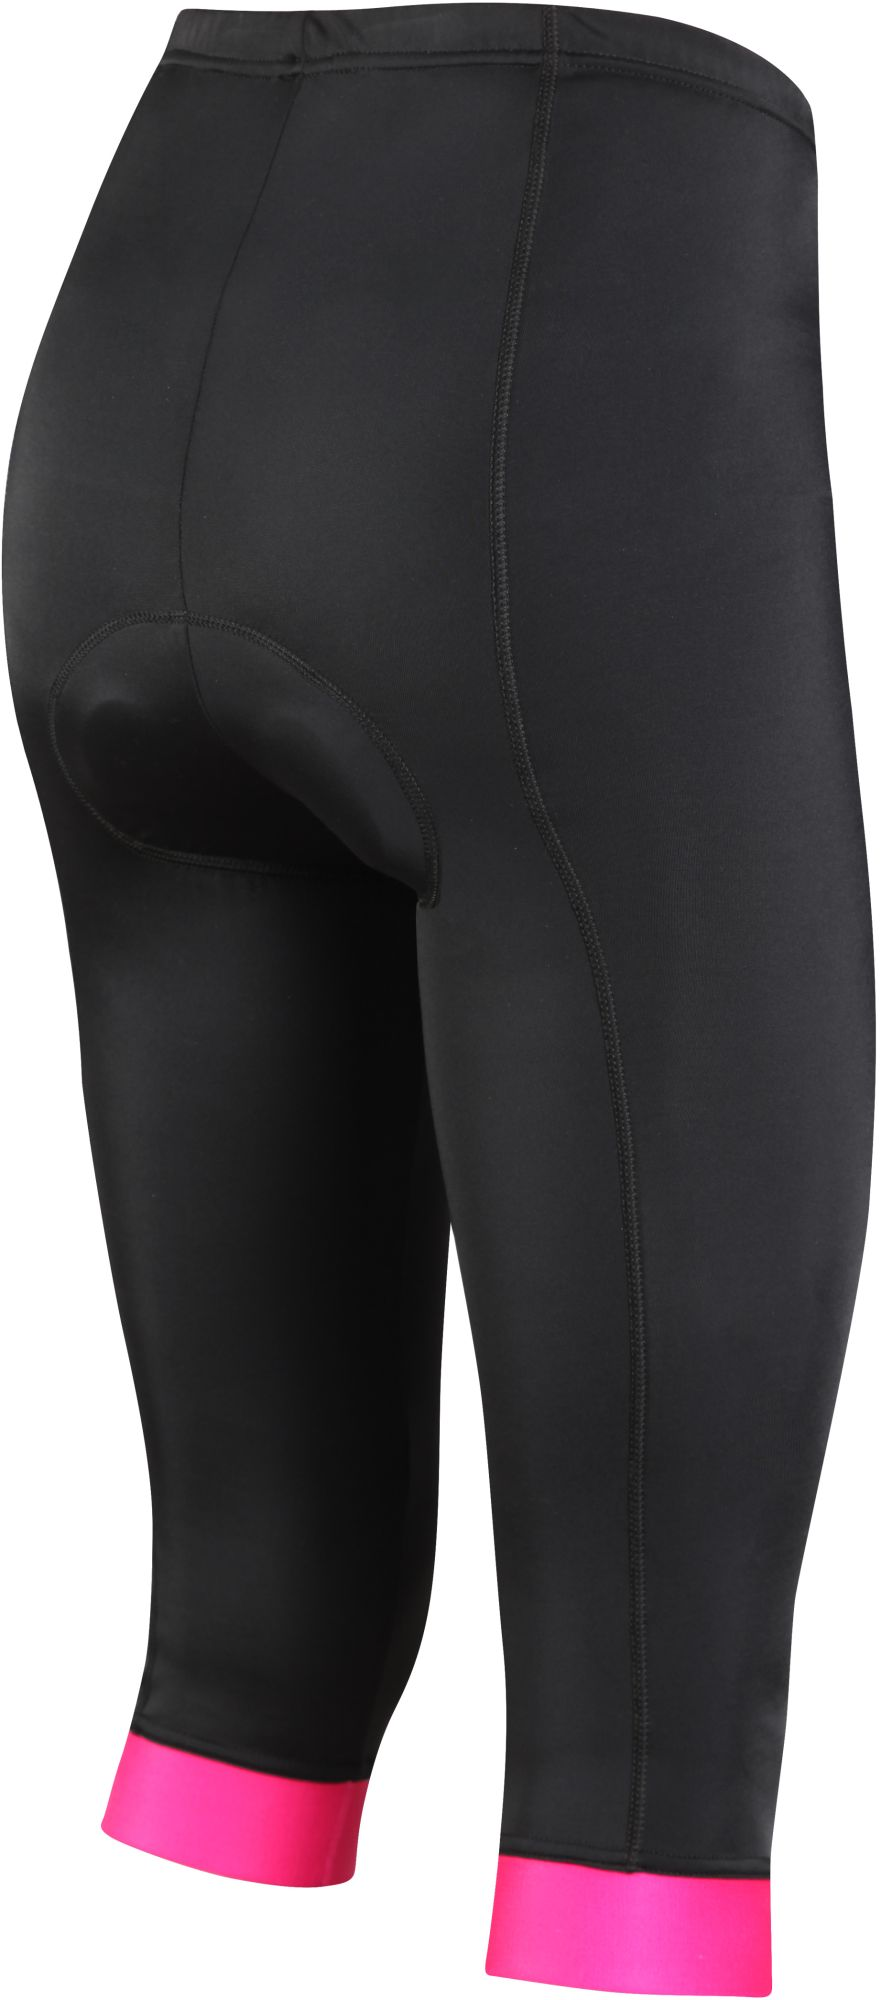 Etape SARA 3 4 KALHOTY W. Dámské cyklistické kalhoty. Dámské cyklistické  kalhoty 9f5d8dd756